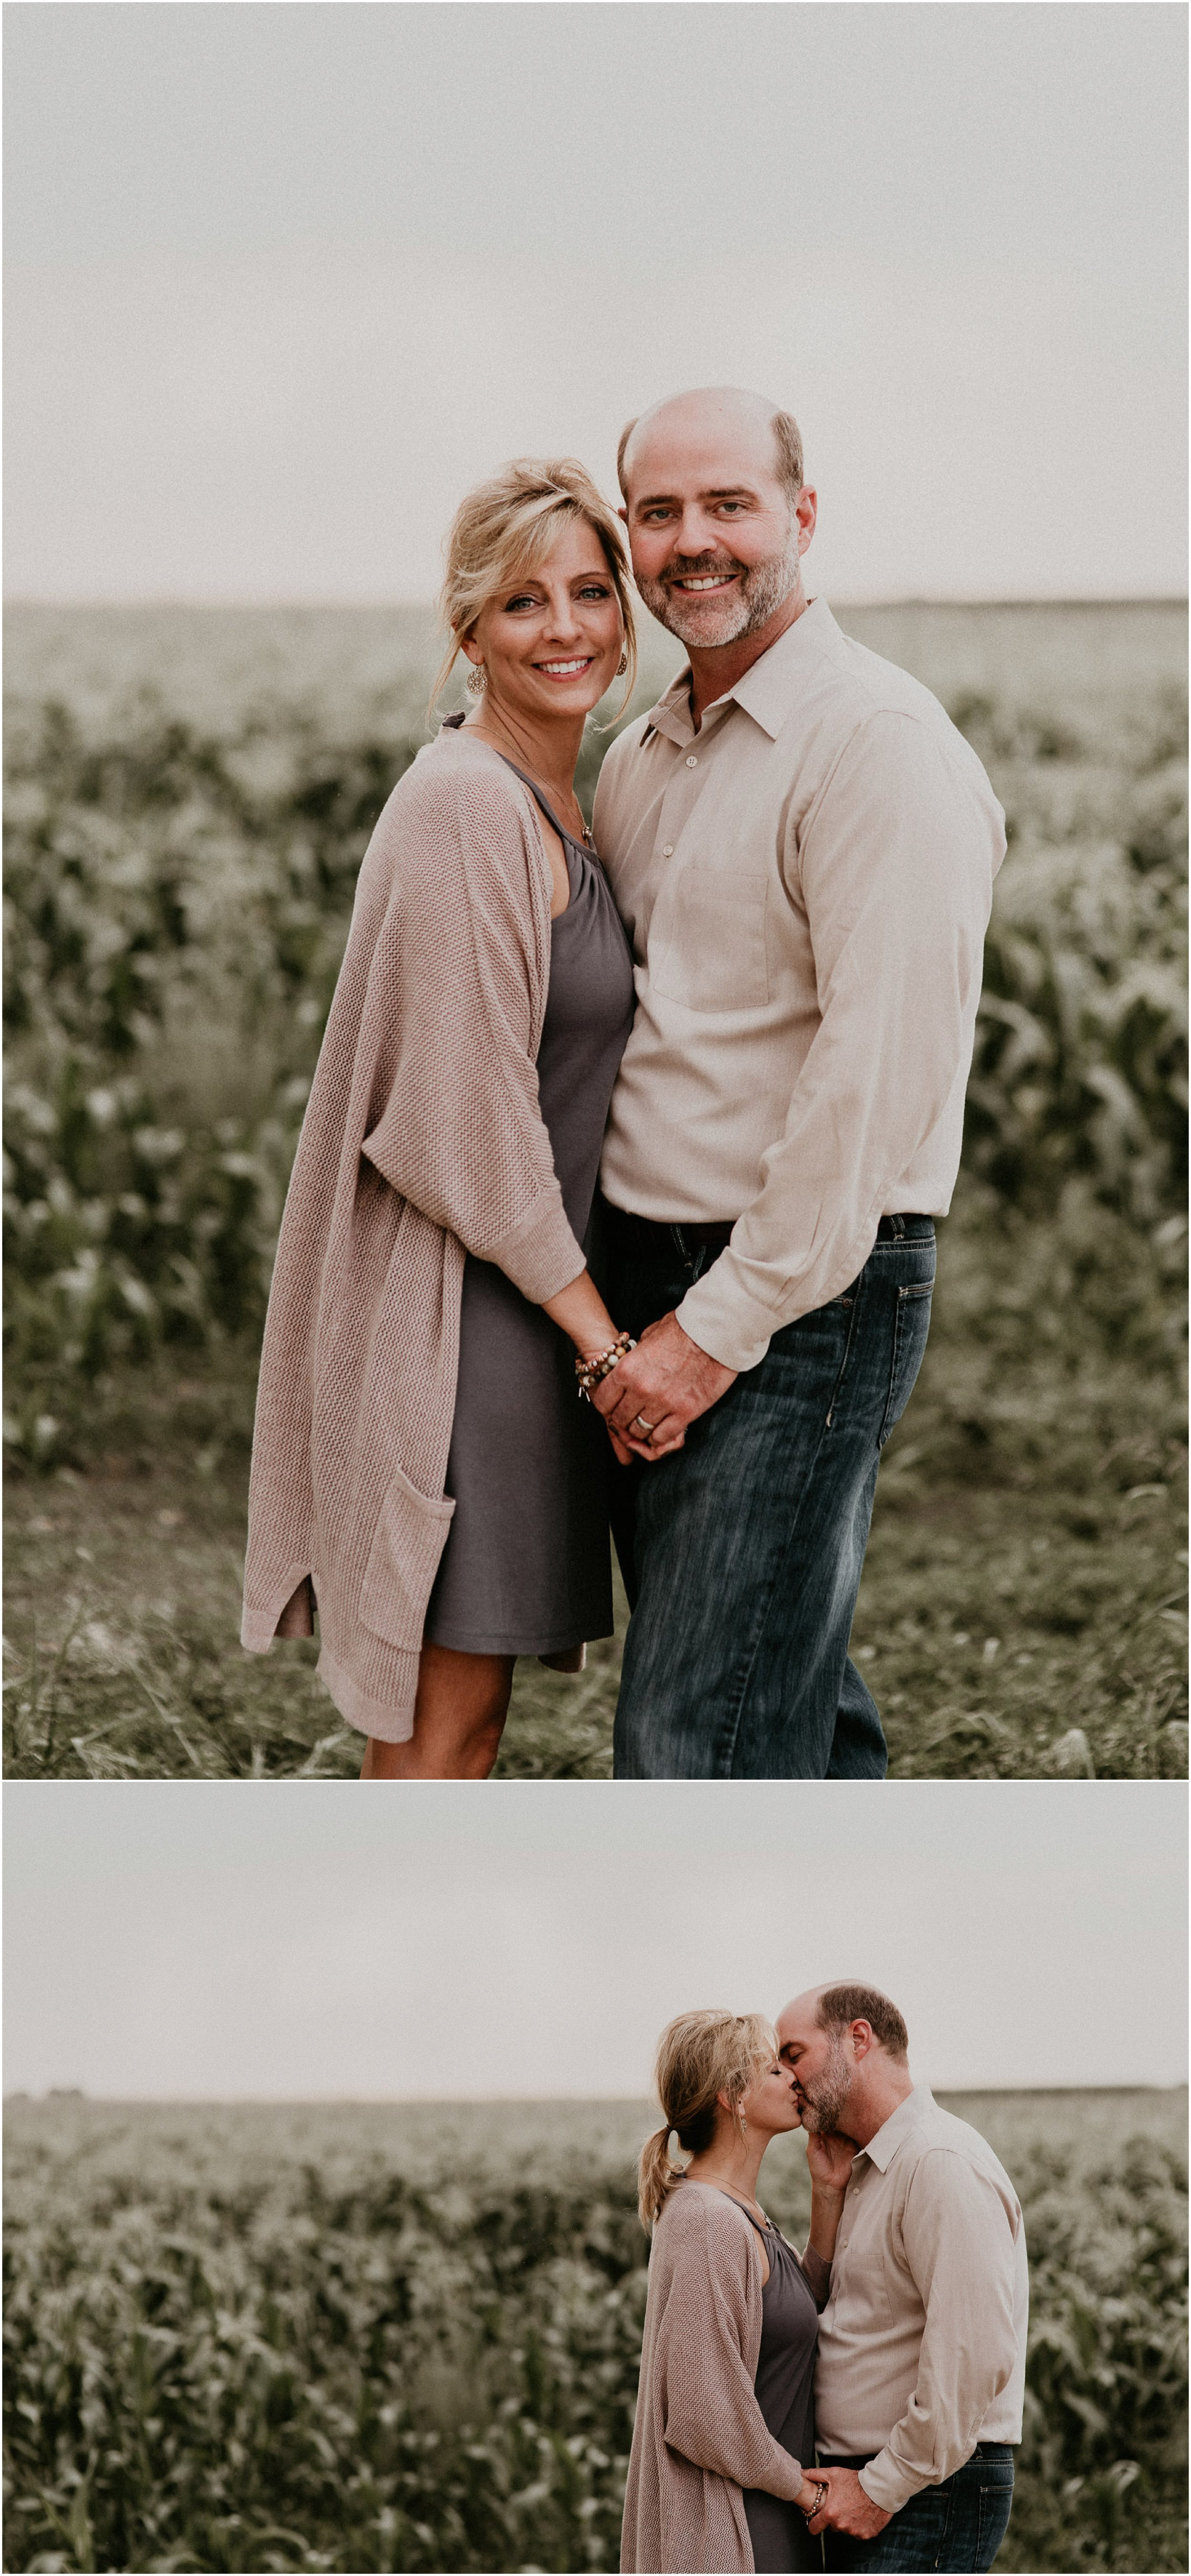 Boise Senior Boudoir Wedding Photographer Family Pictures Idaho Couples Married Corn Field Makayla Madden Photography